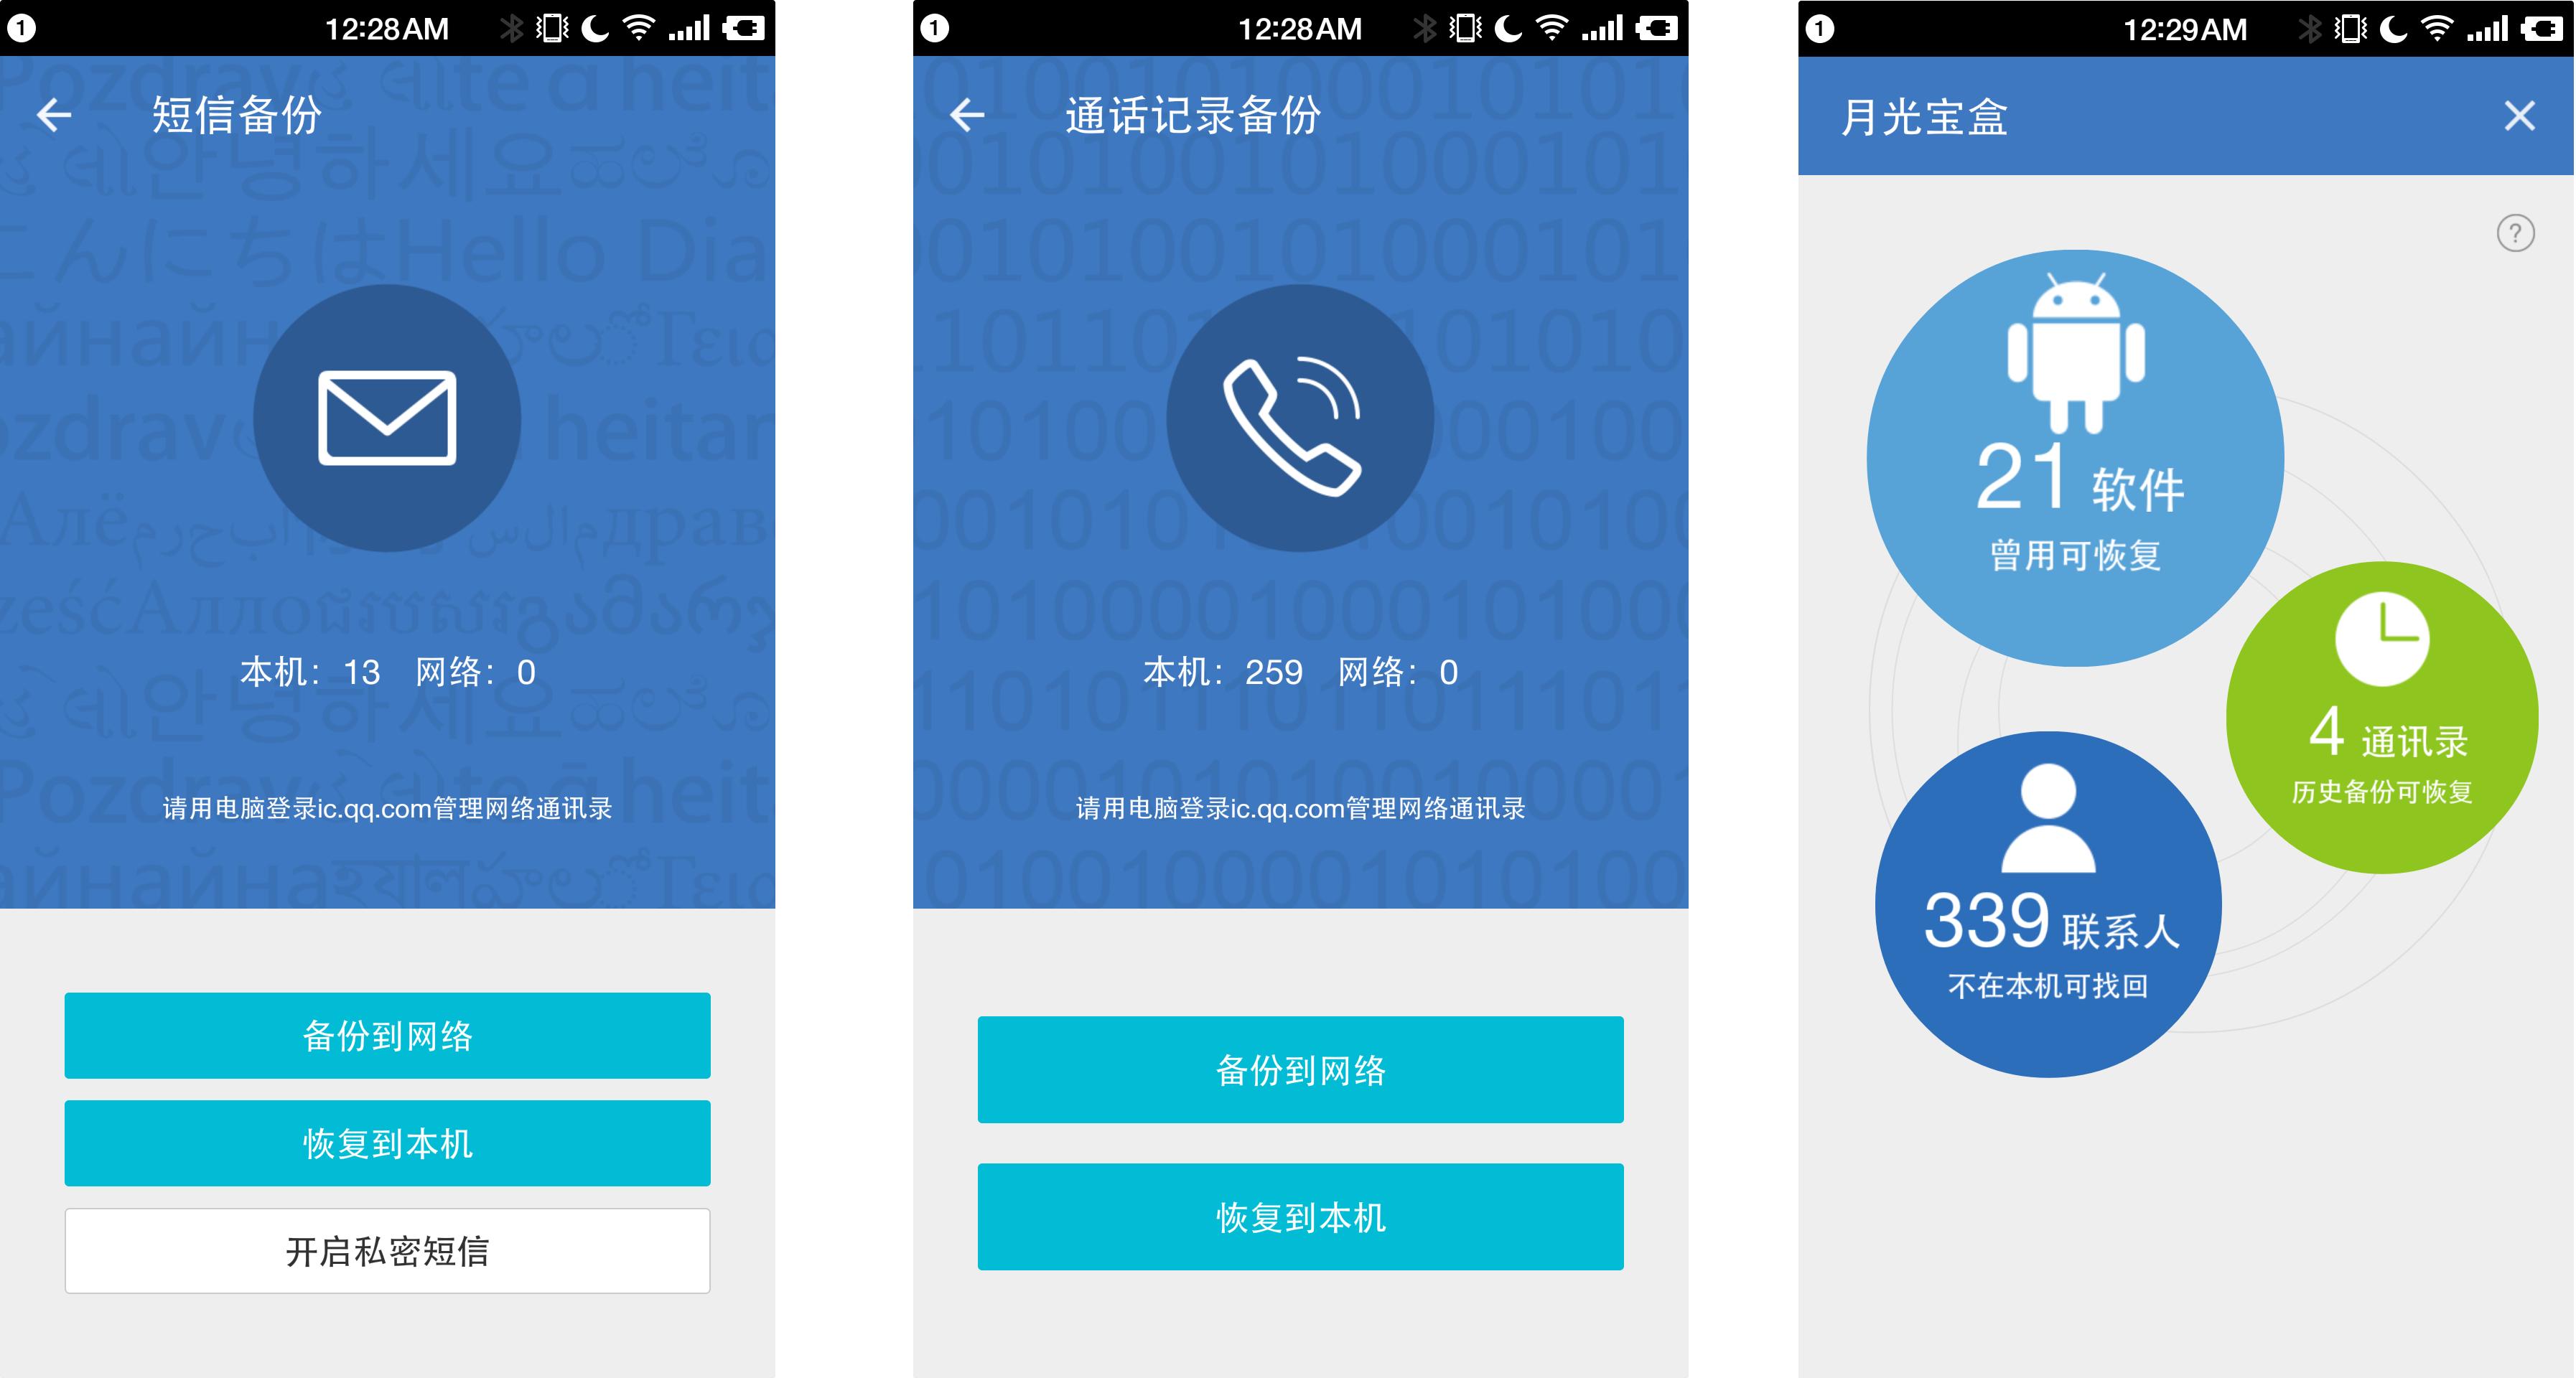 Screenshot_2015-11-14-00-28-22-900_QQ同步助手.png